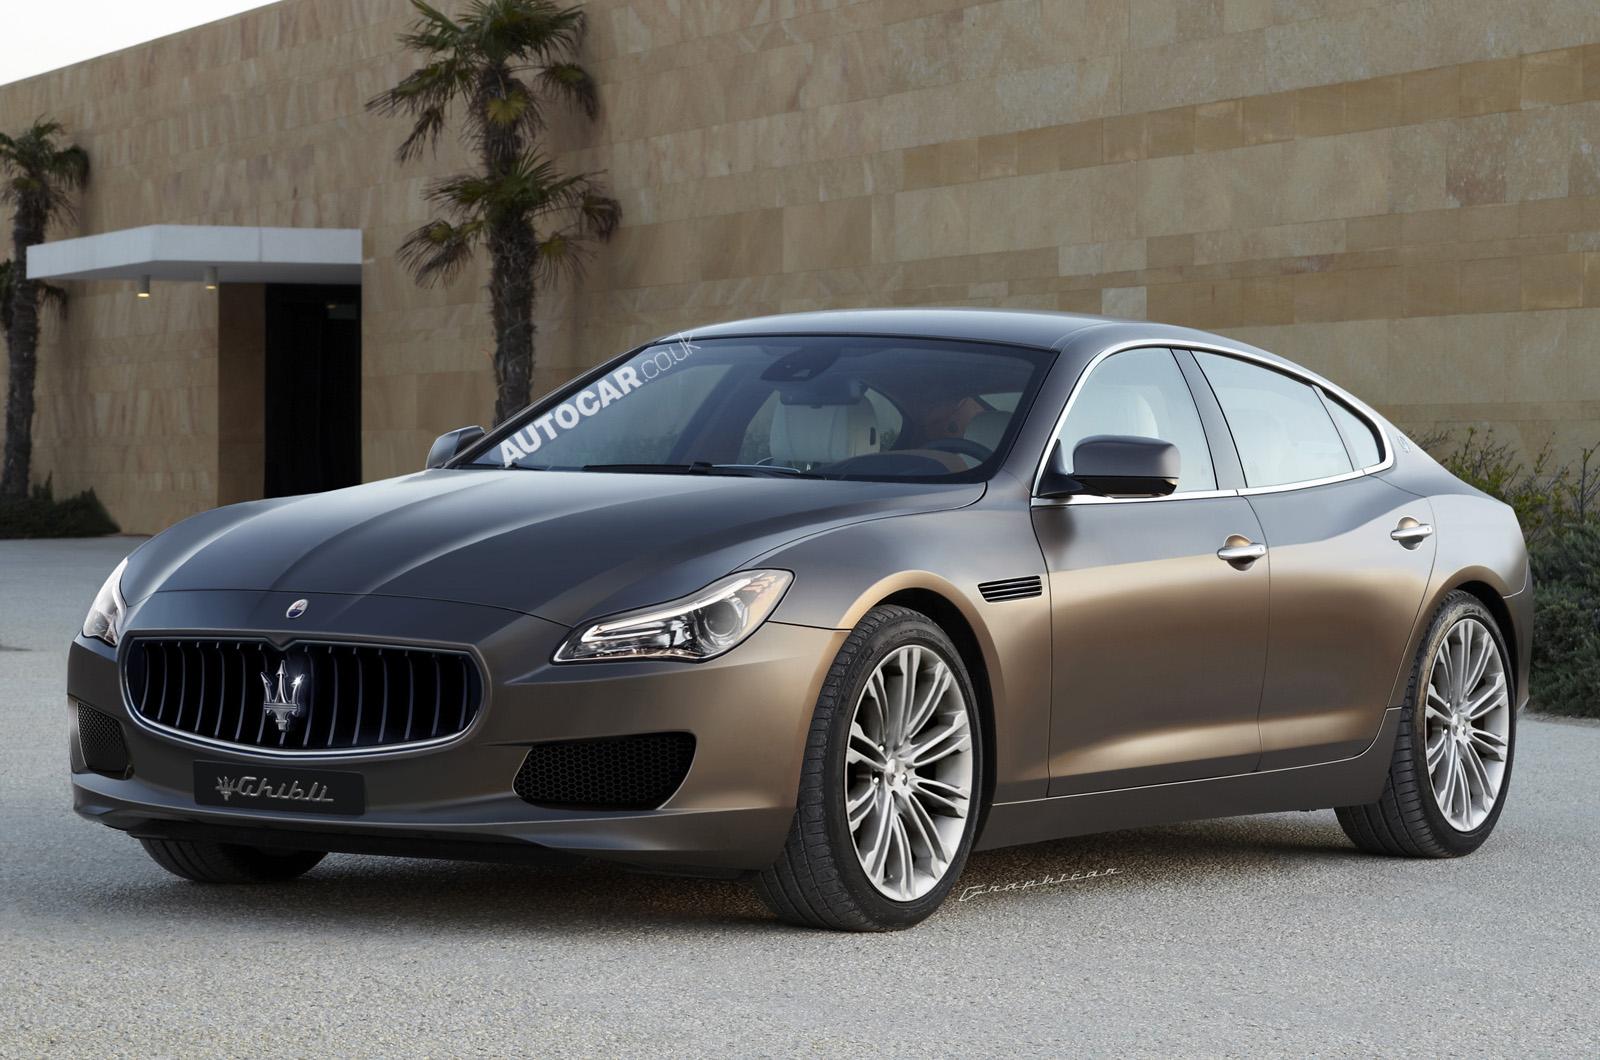 2014 - [Maserati] Ghibli - Page 3 Maserati%20ghibli%202_1